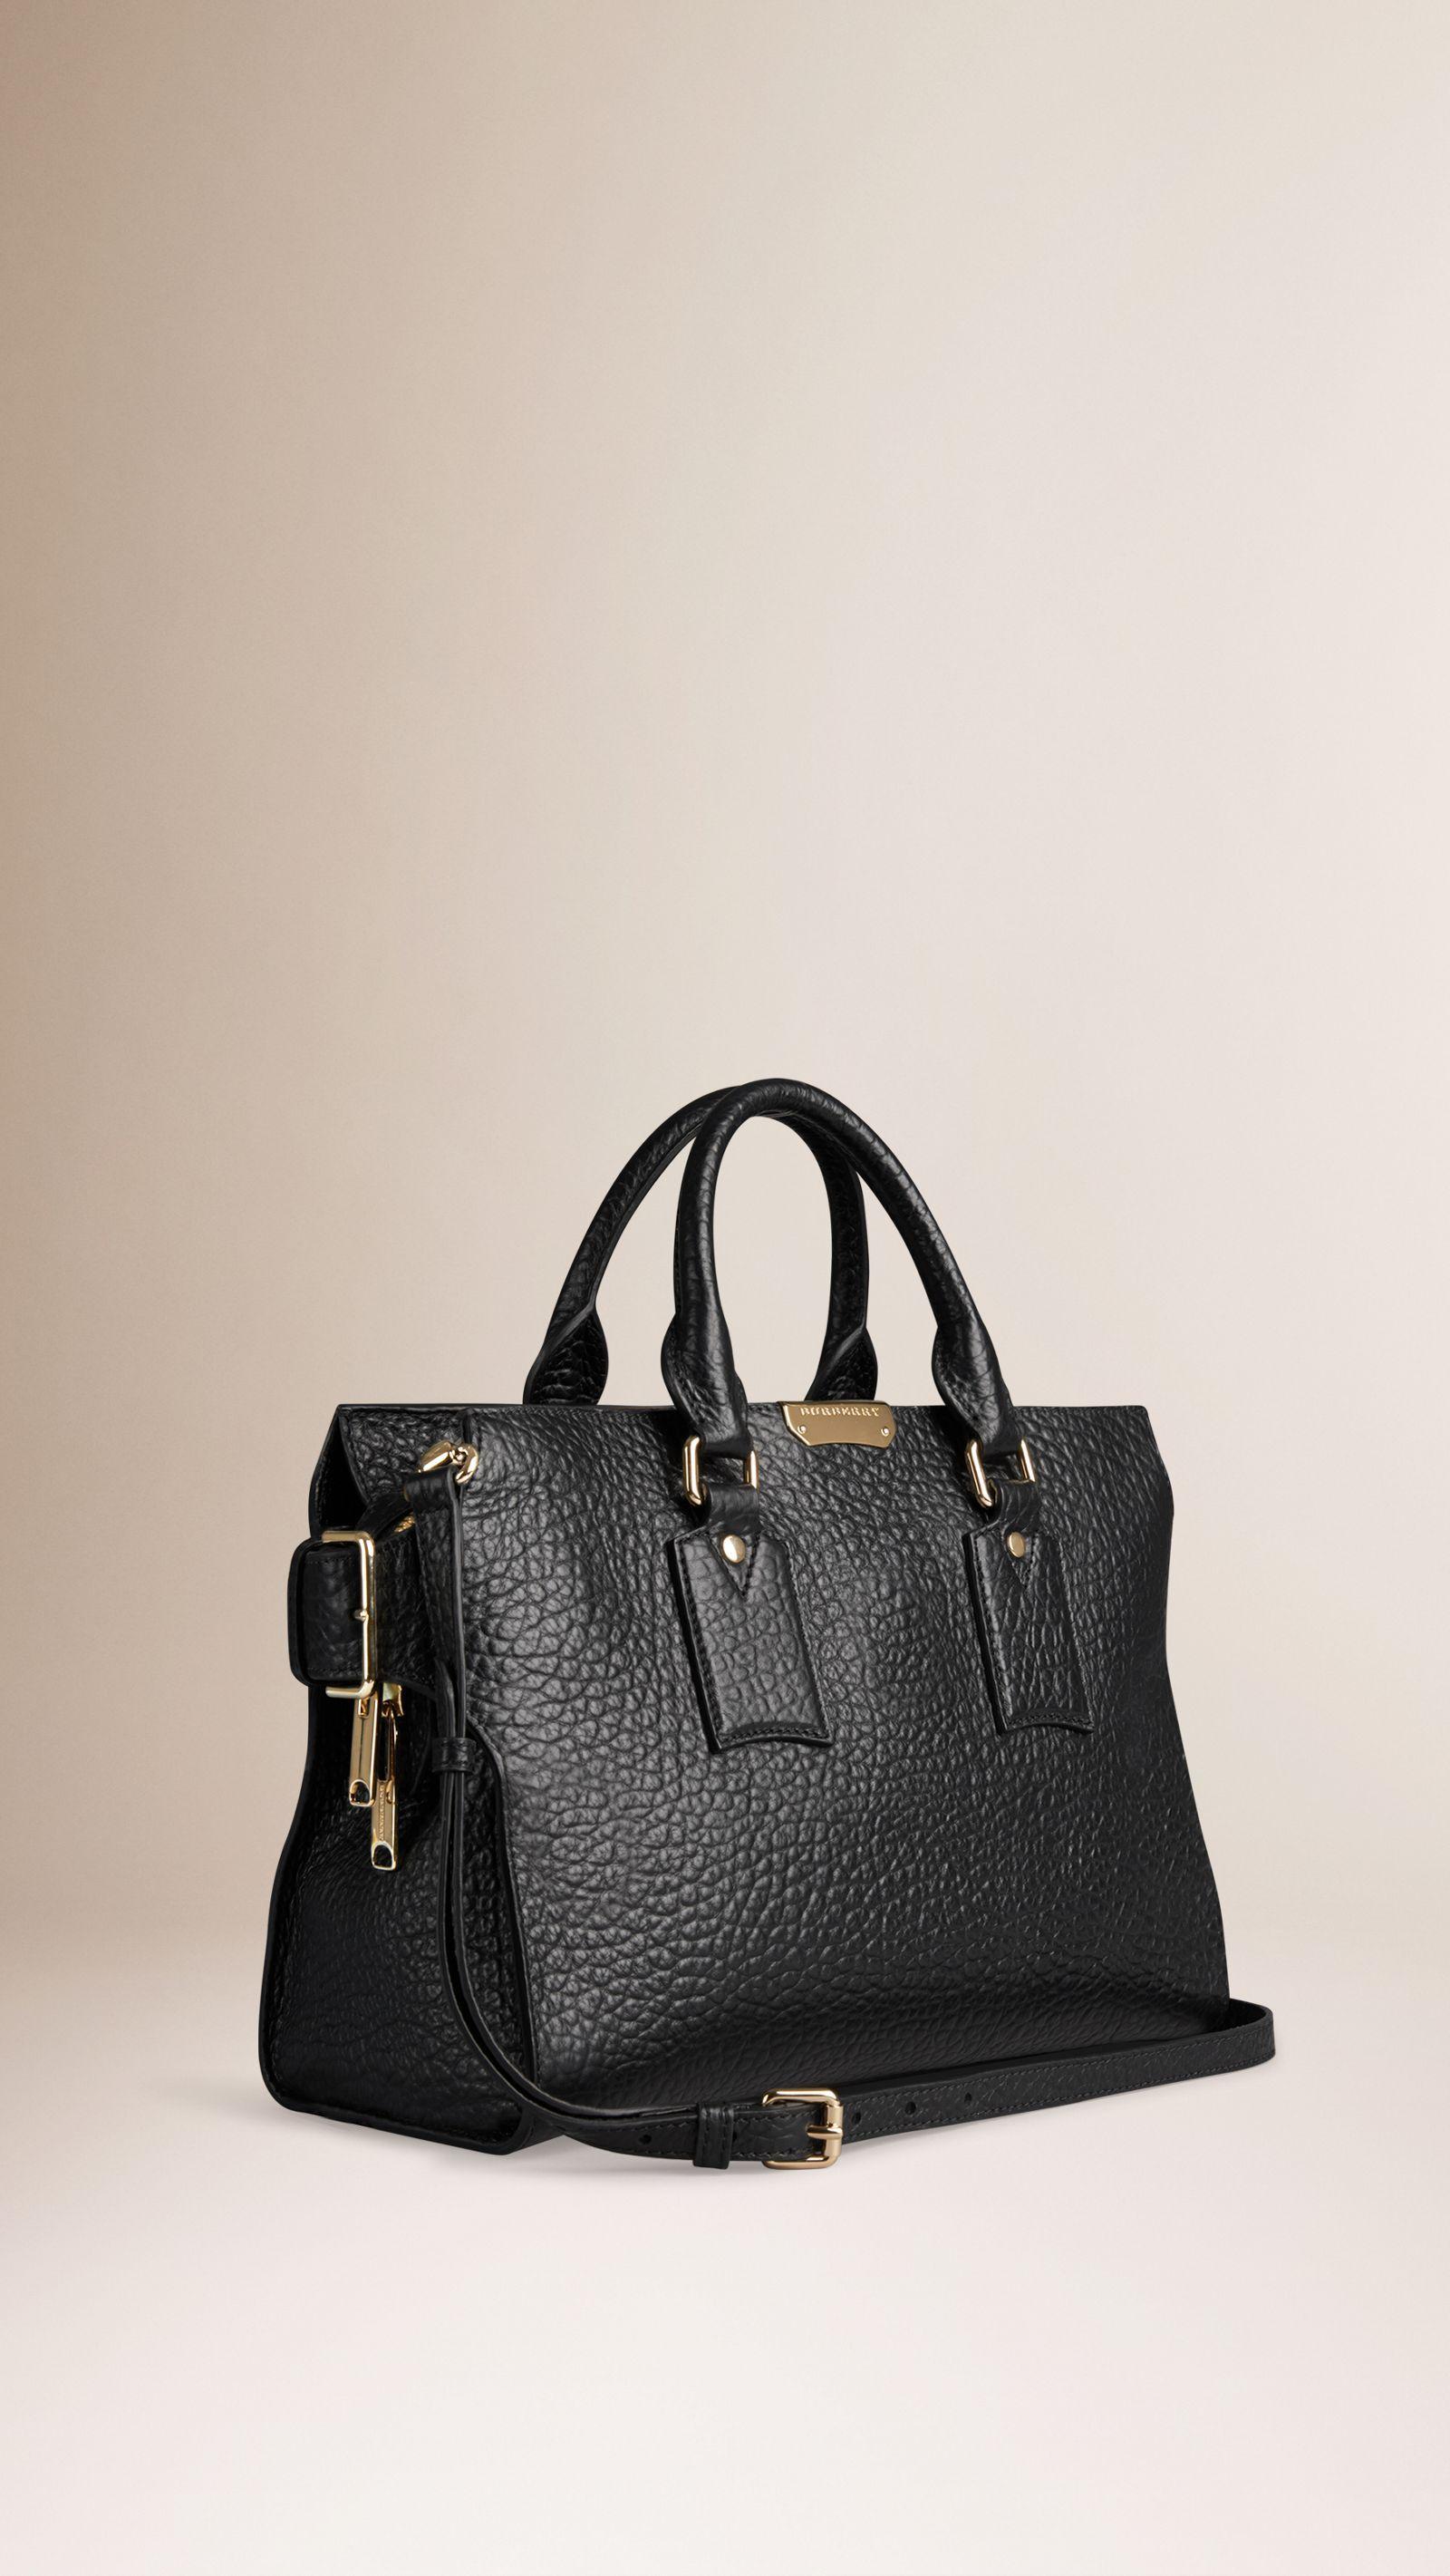 The Medium Clifton in Signature Grain Leather Black  852a27b7bb19a